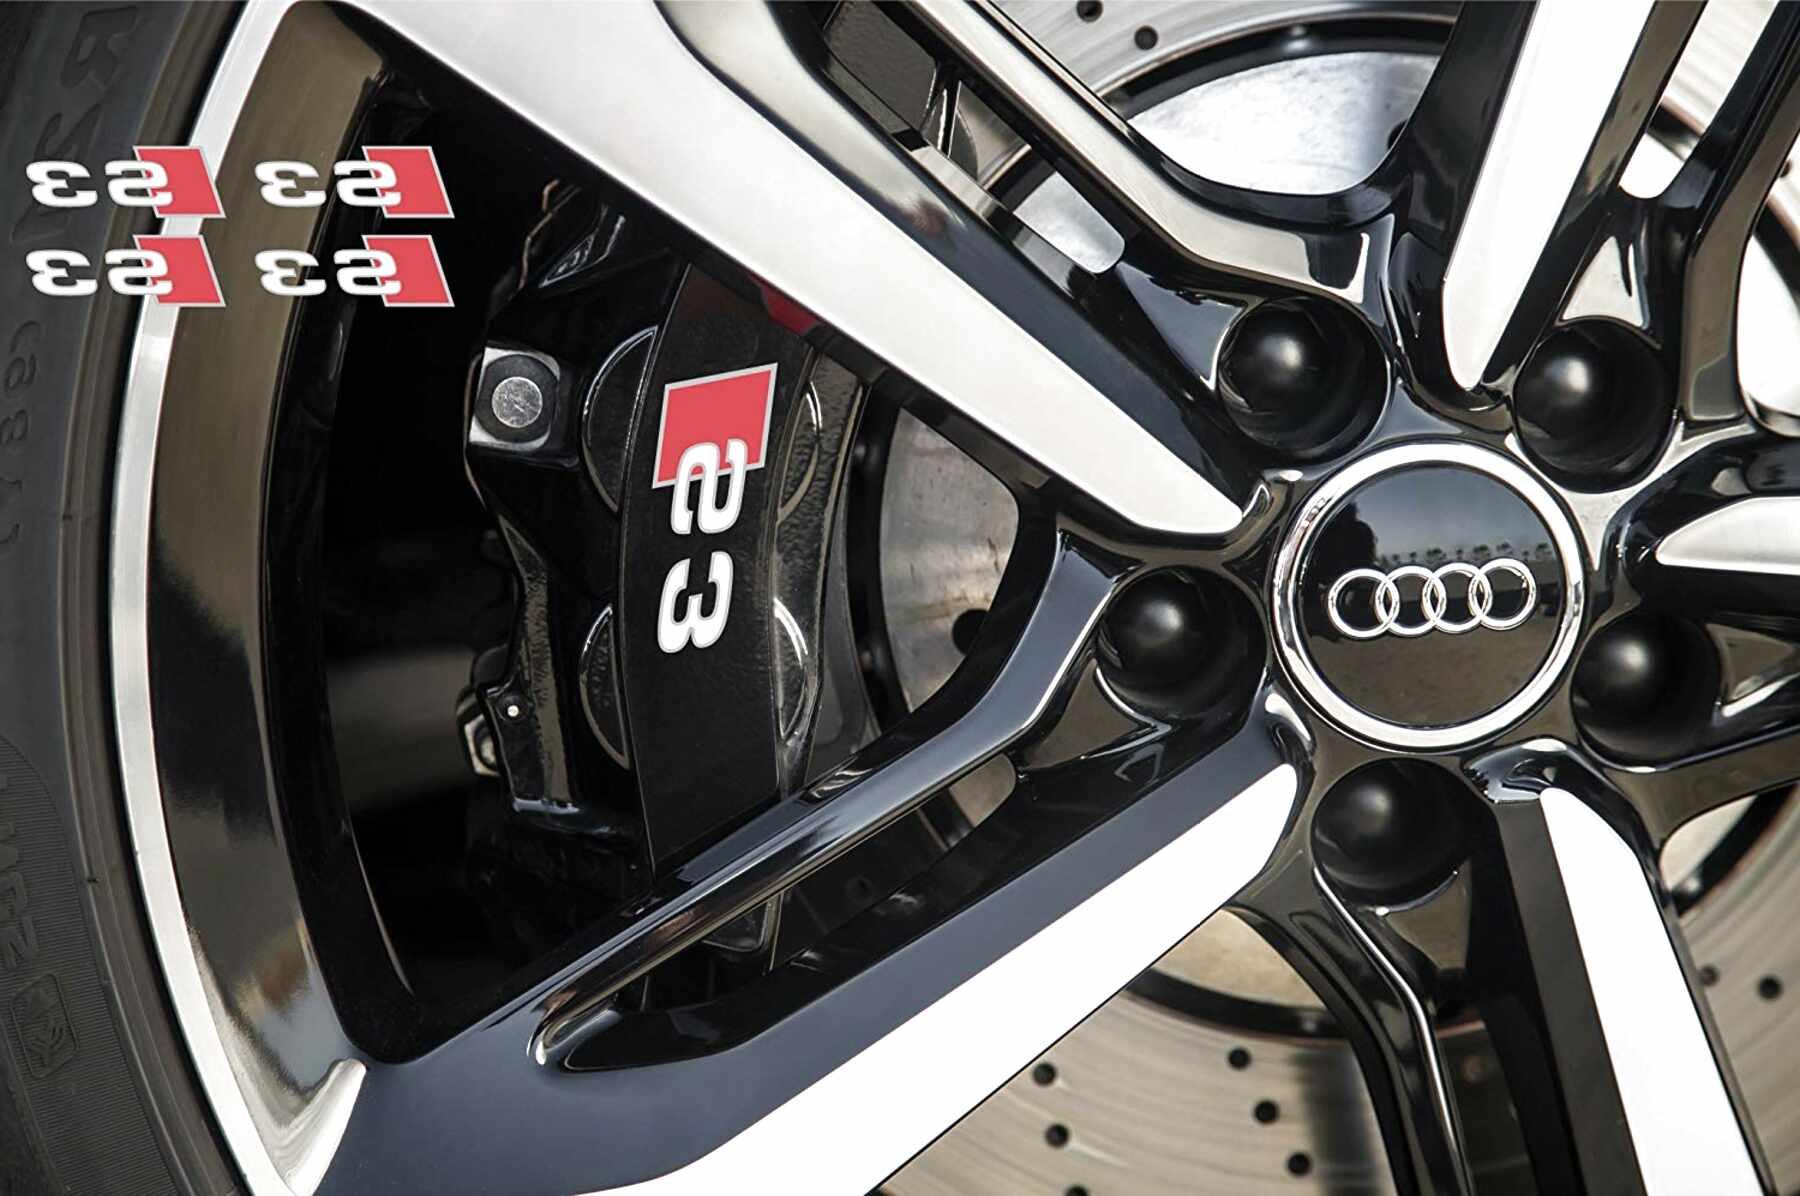 Audi A3 1996-2012 Front brake caliper slider pin kit guide pin kit bolt S7022DD